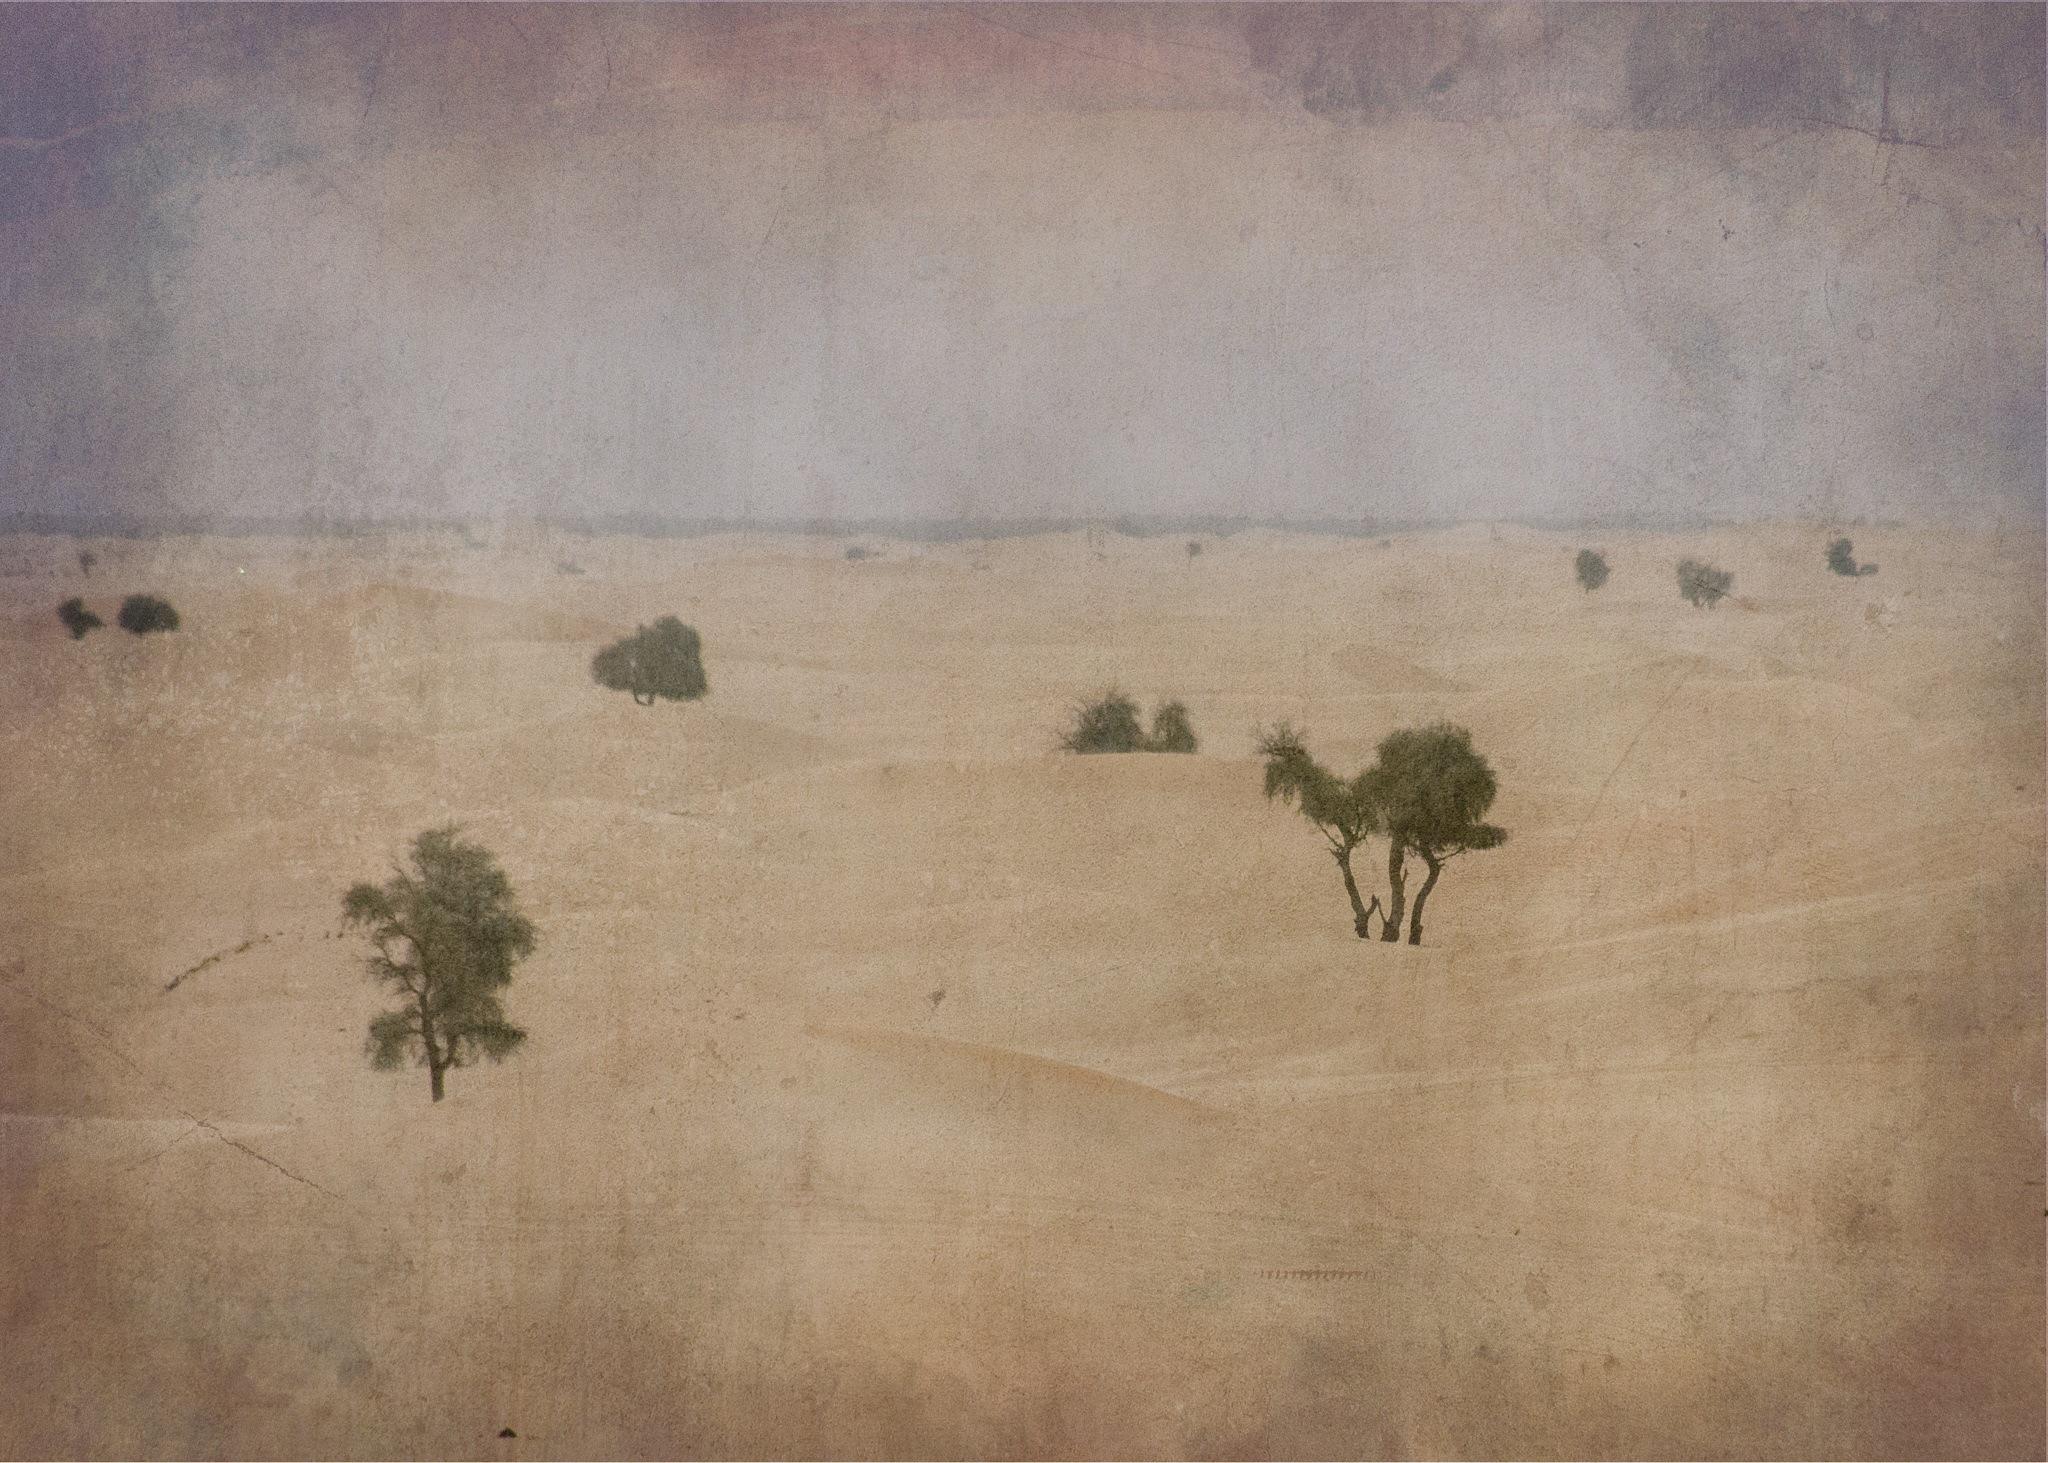 Digital Experiments III: Desert by kleptography